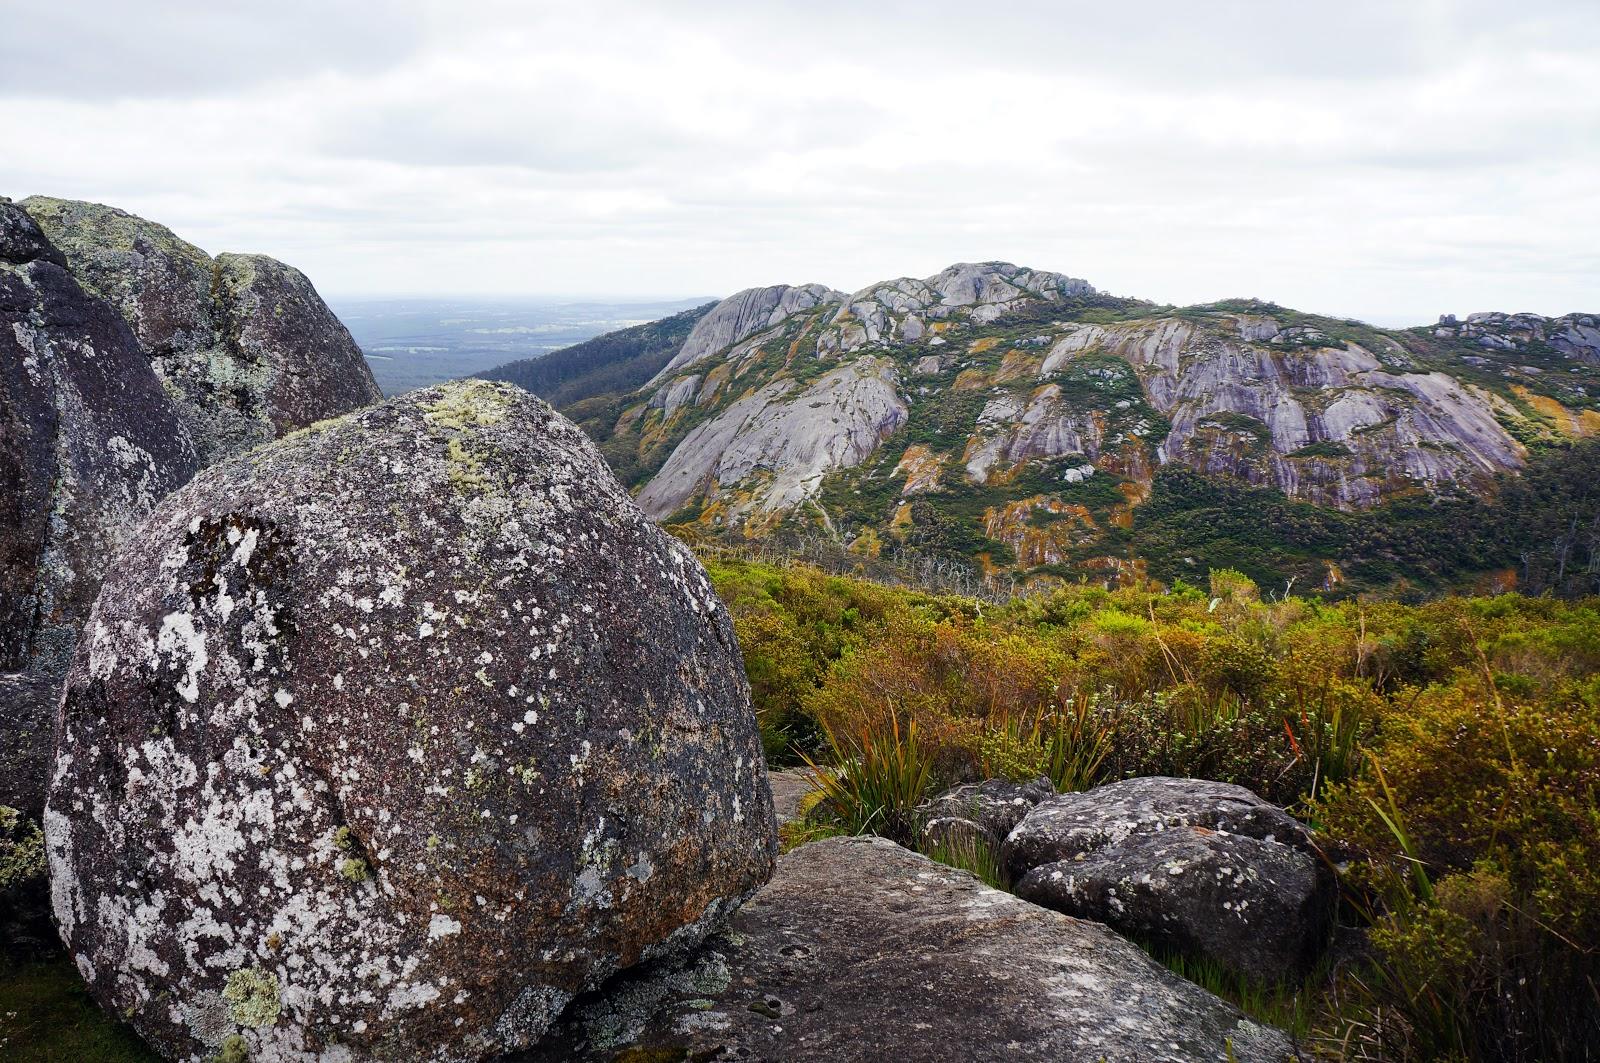 Porongorup Range (Image courtesy of The Long Way's Better)